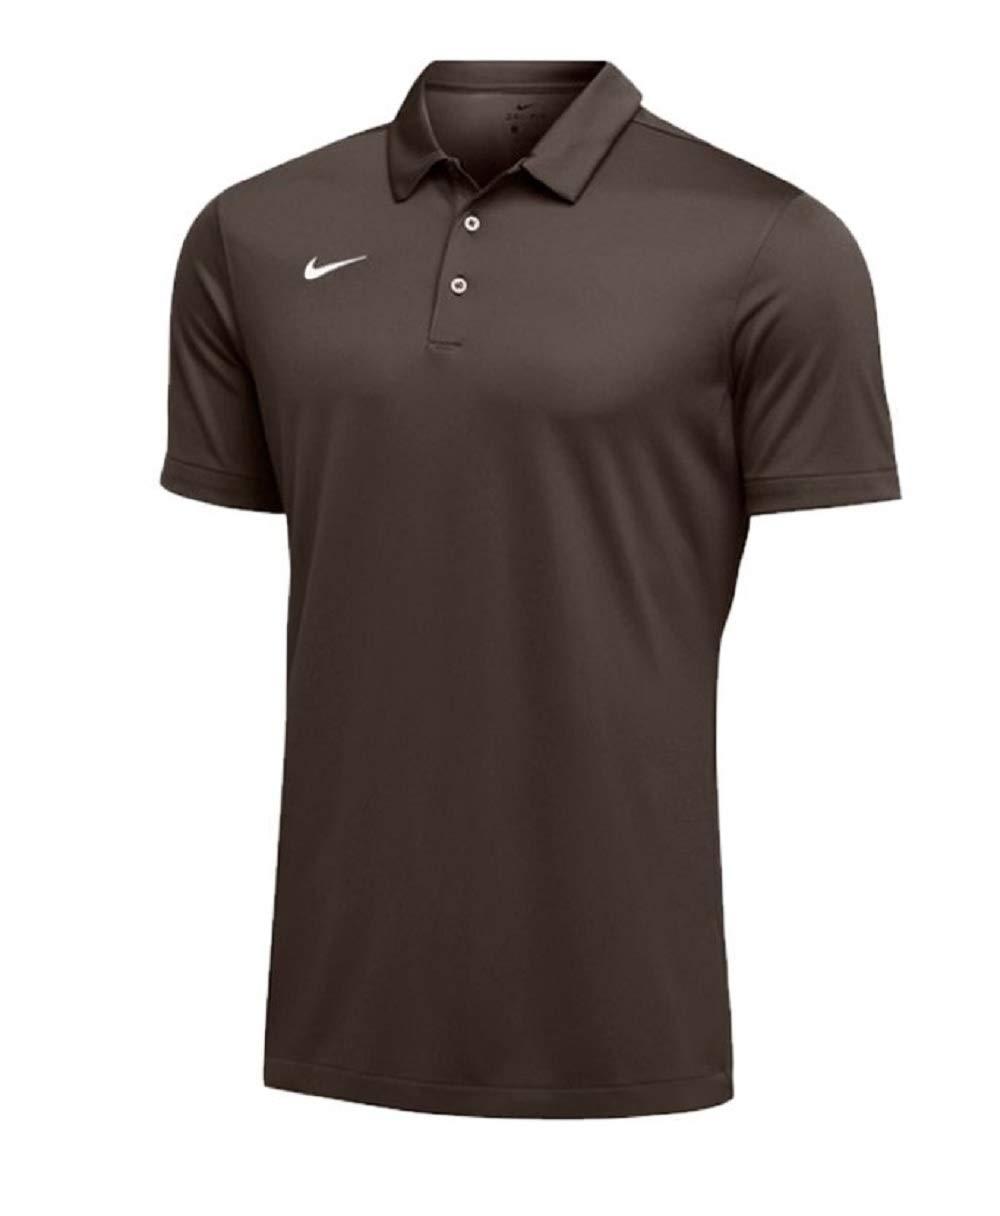 Nike Mens Dri-FIT Short Sleeve Polo Shirt (X-Large, Dark Brown) by Nike